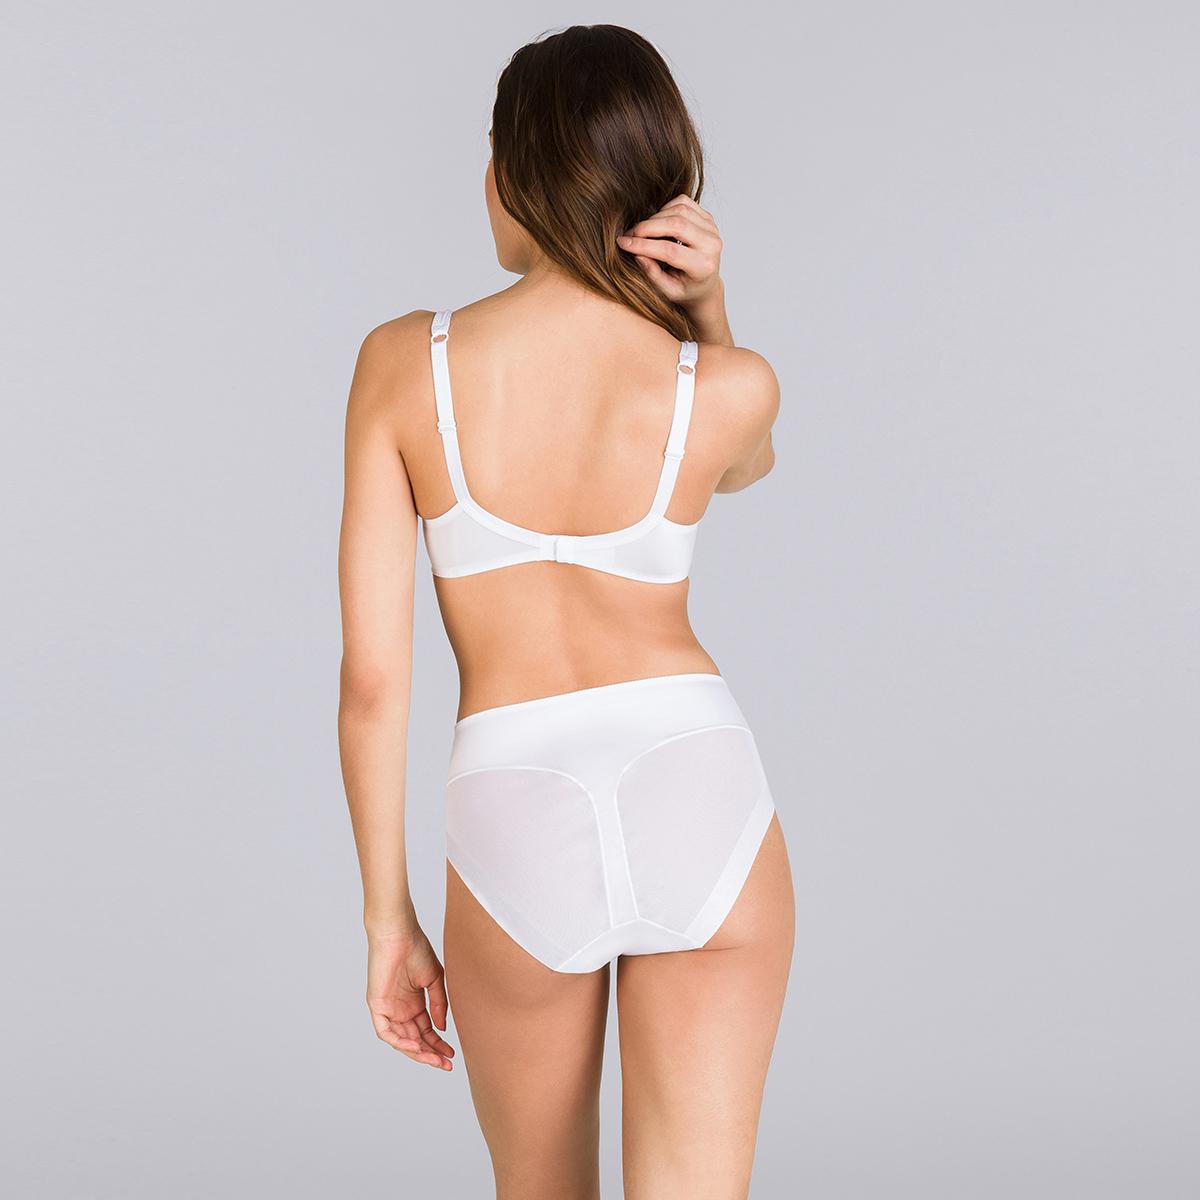 Soutien-gorge emboîtant blanc - Perfect Silhouette, , PLAYTEX